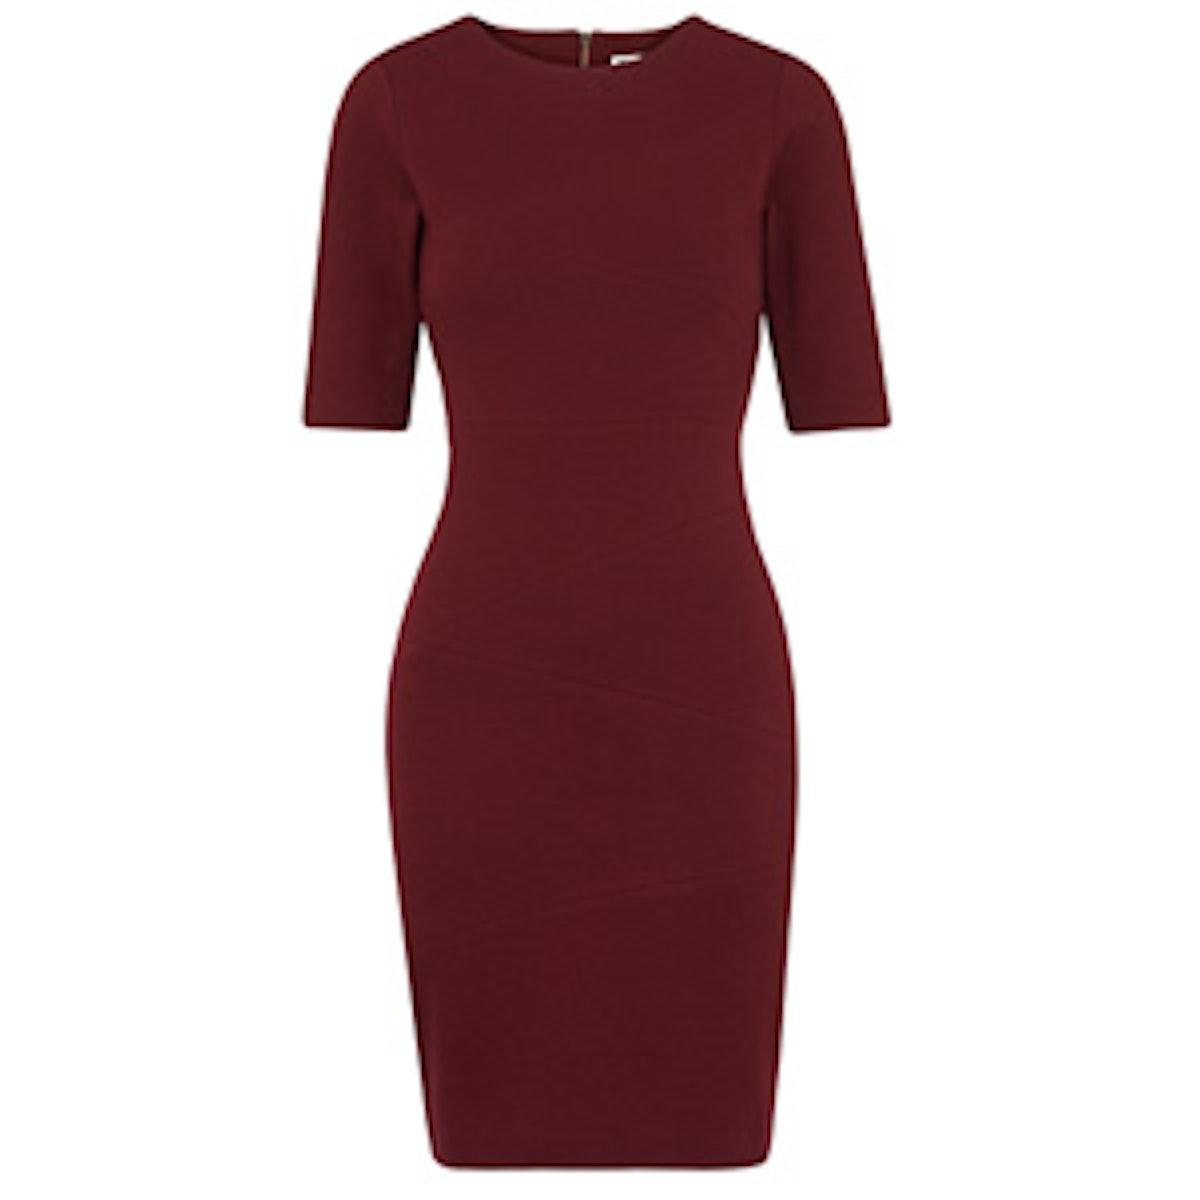 Kerry Ribbed Jersey Dress